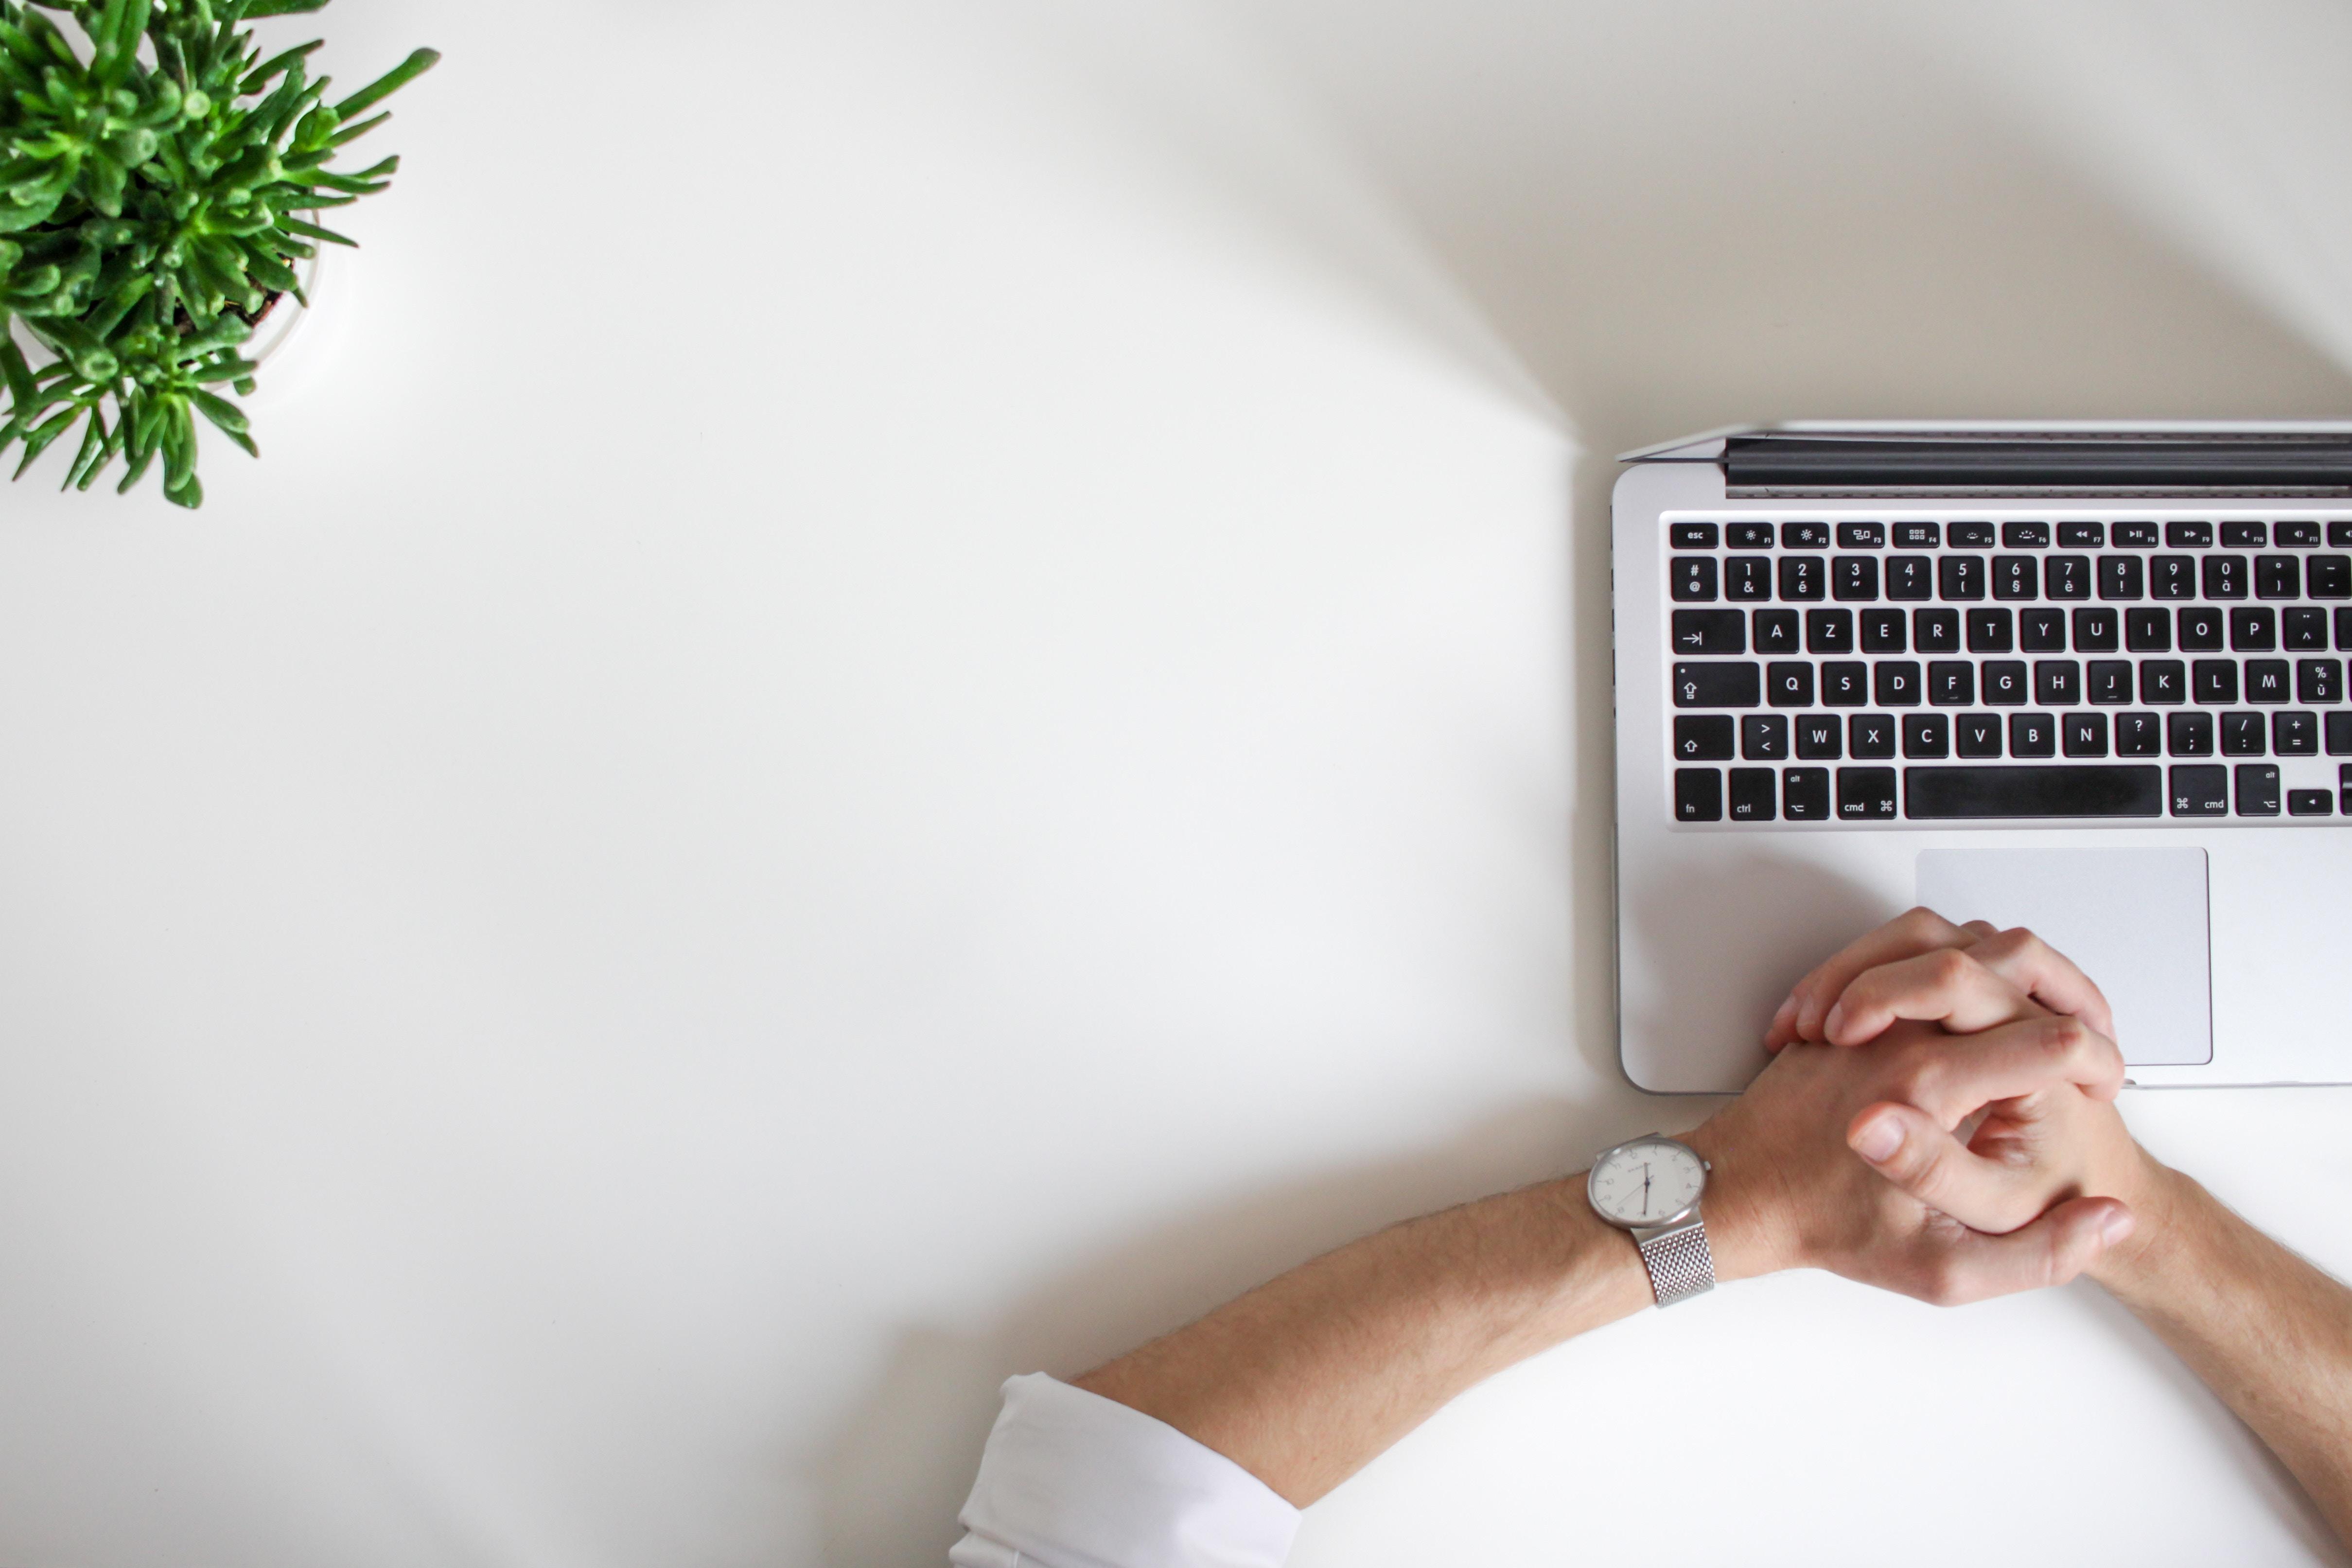 5 Common Mistakes When Designing Online Customer Surveys